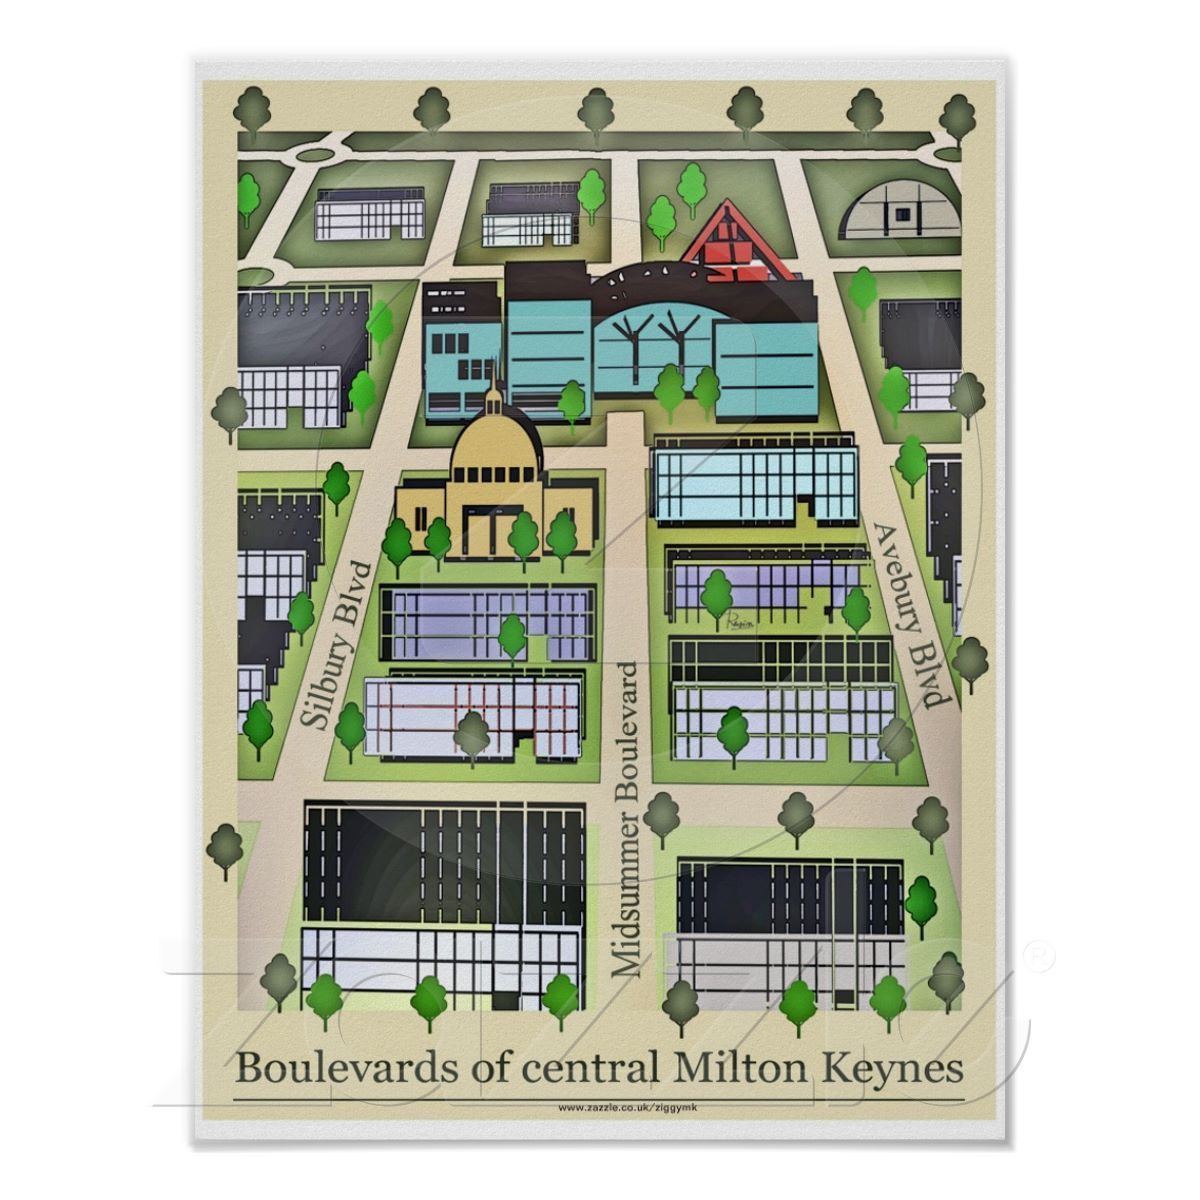 Milton keynes boulevards poster print zazzlecouk